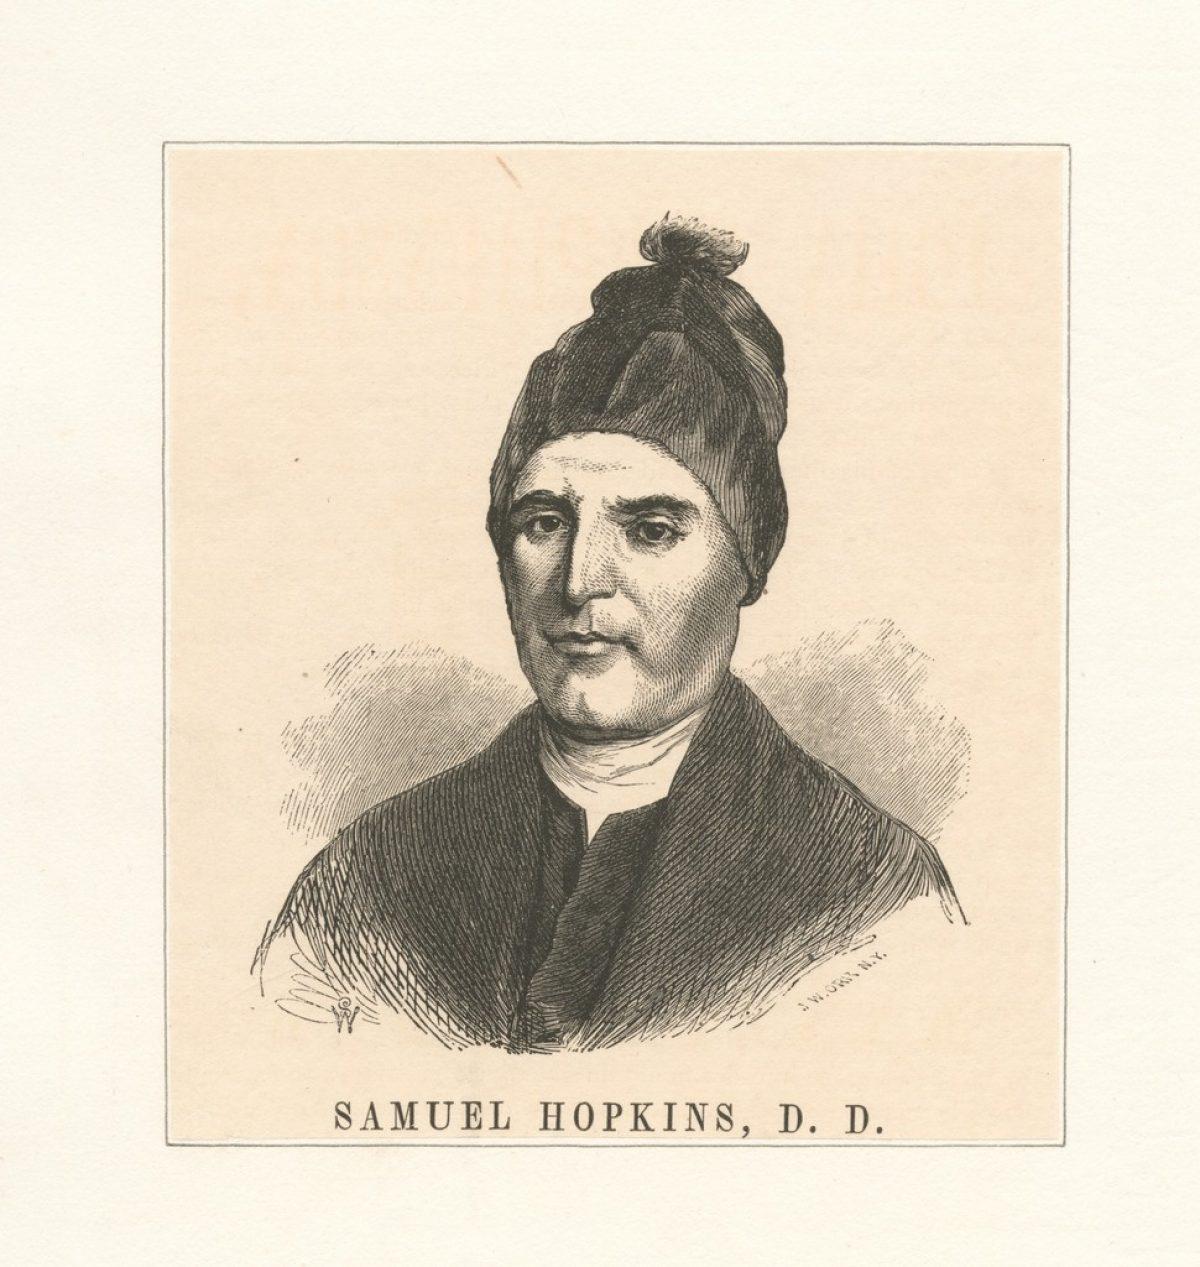 Samuel hopkins 9ad3c0